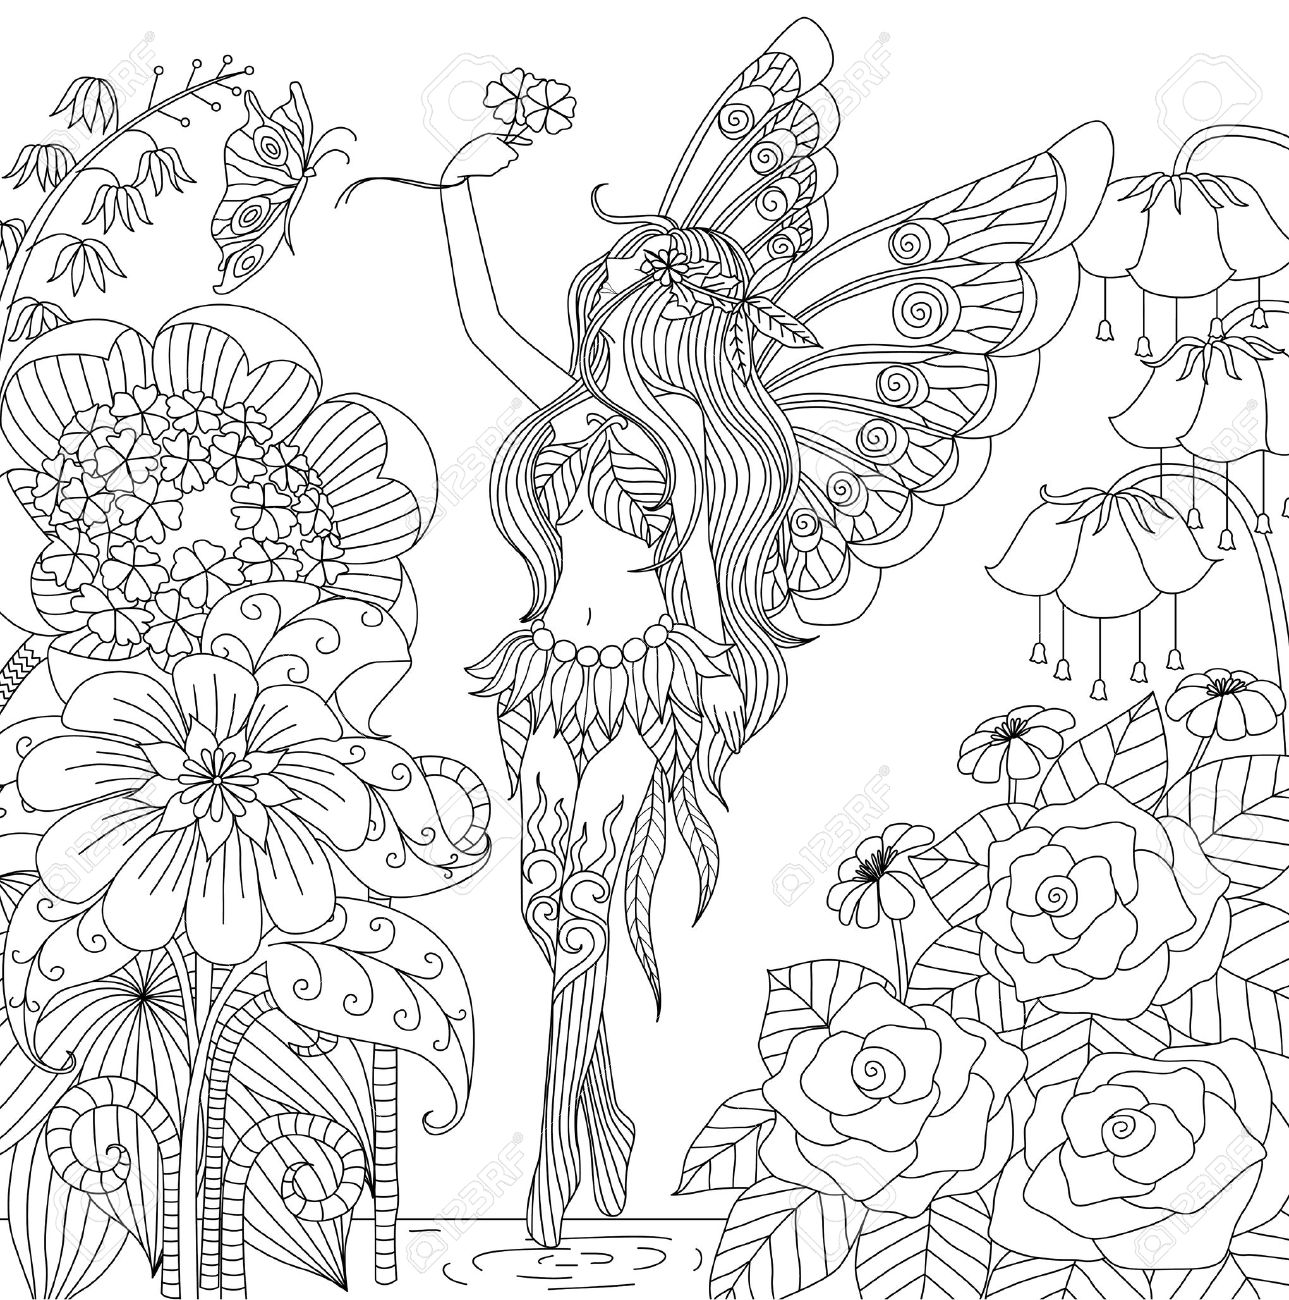 Increíble Flores Para Colorear Libros Bosquejo - Dibujos Para ...